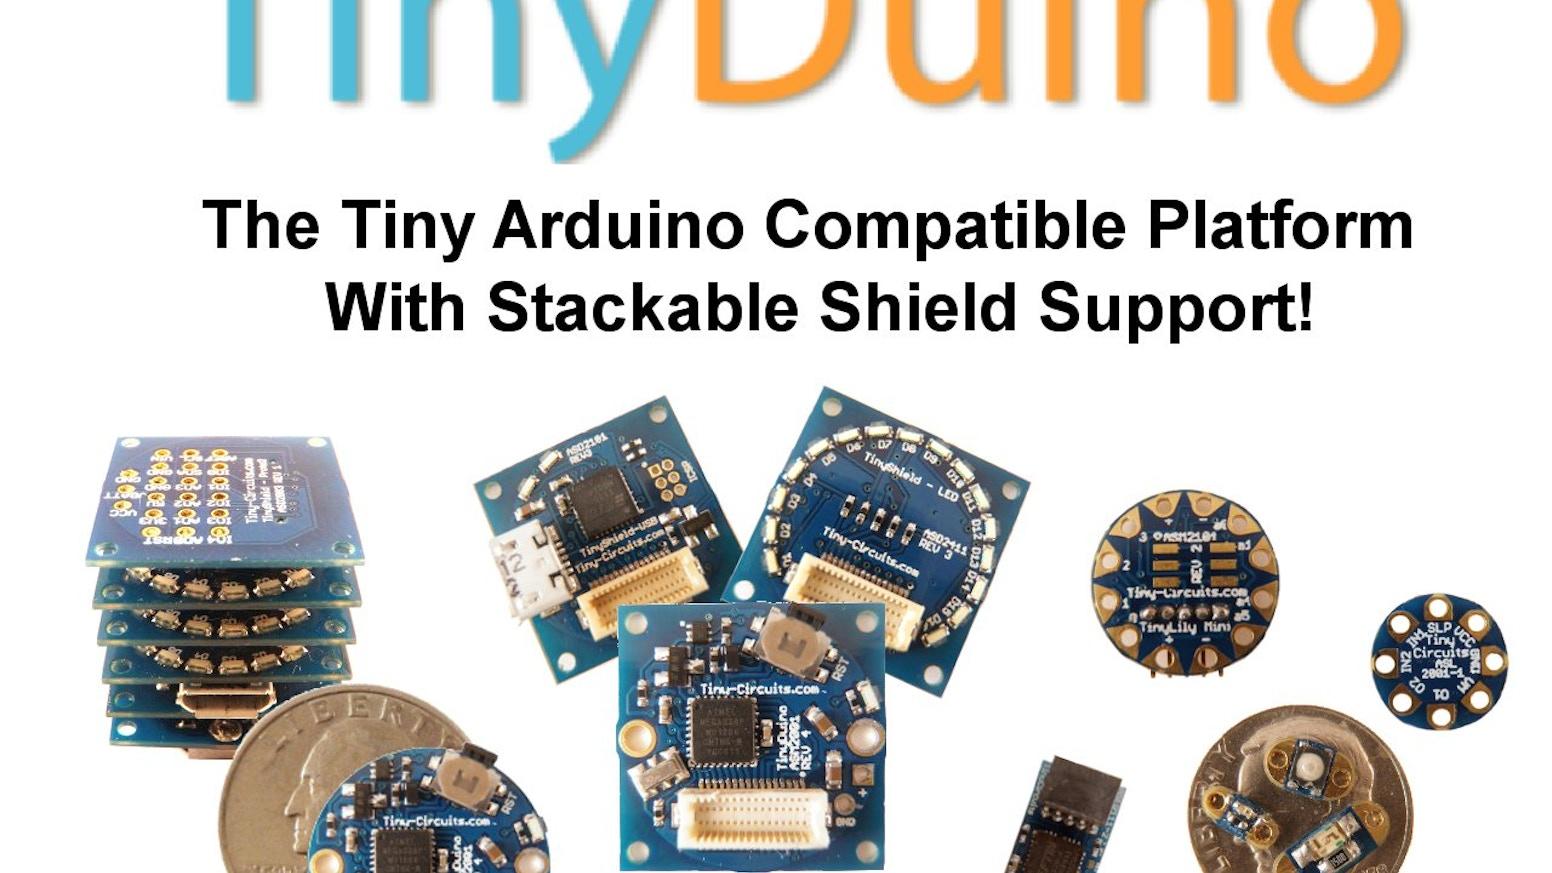 TinyDuino - The Tiny Arduino Compatible Platform w/ Shields